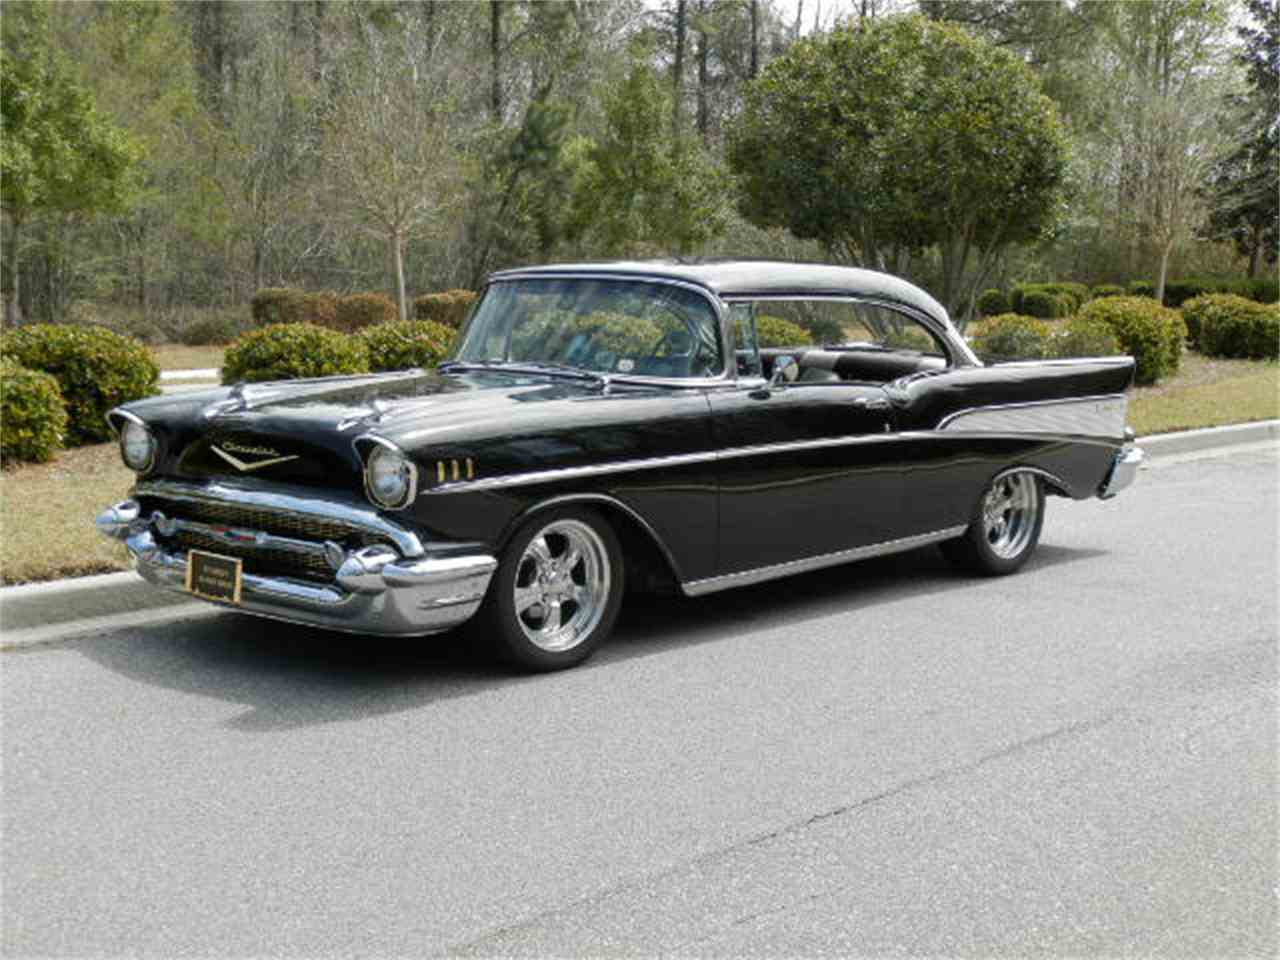 Bel Air Car >> 1957 Chevrolet Bel Air For Sale Classiccars Com Cc 971892